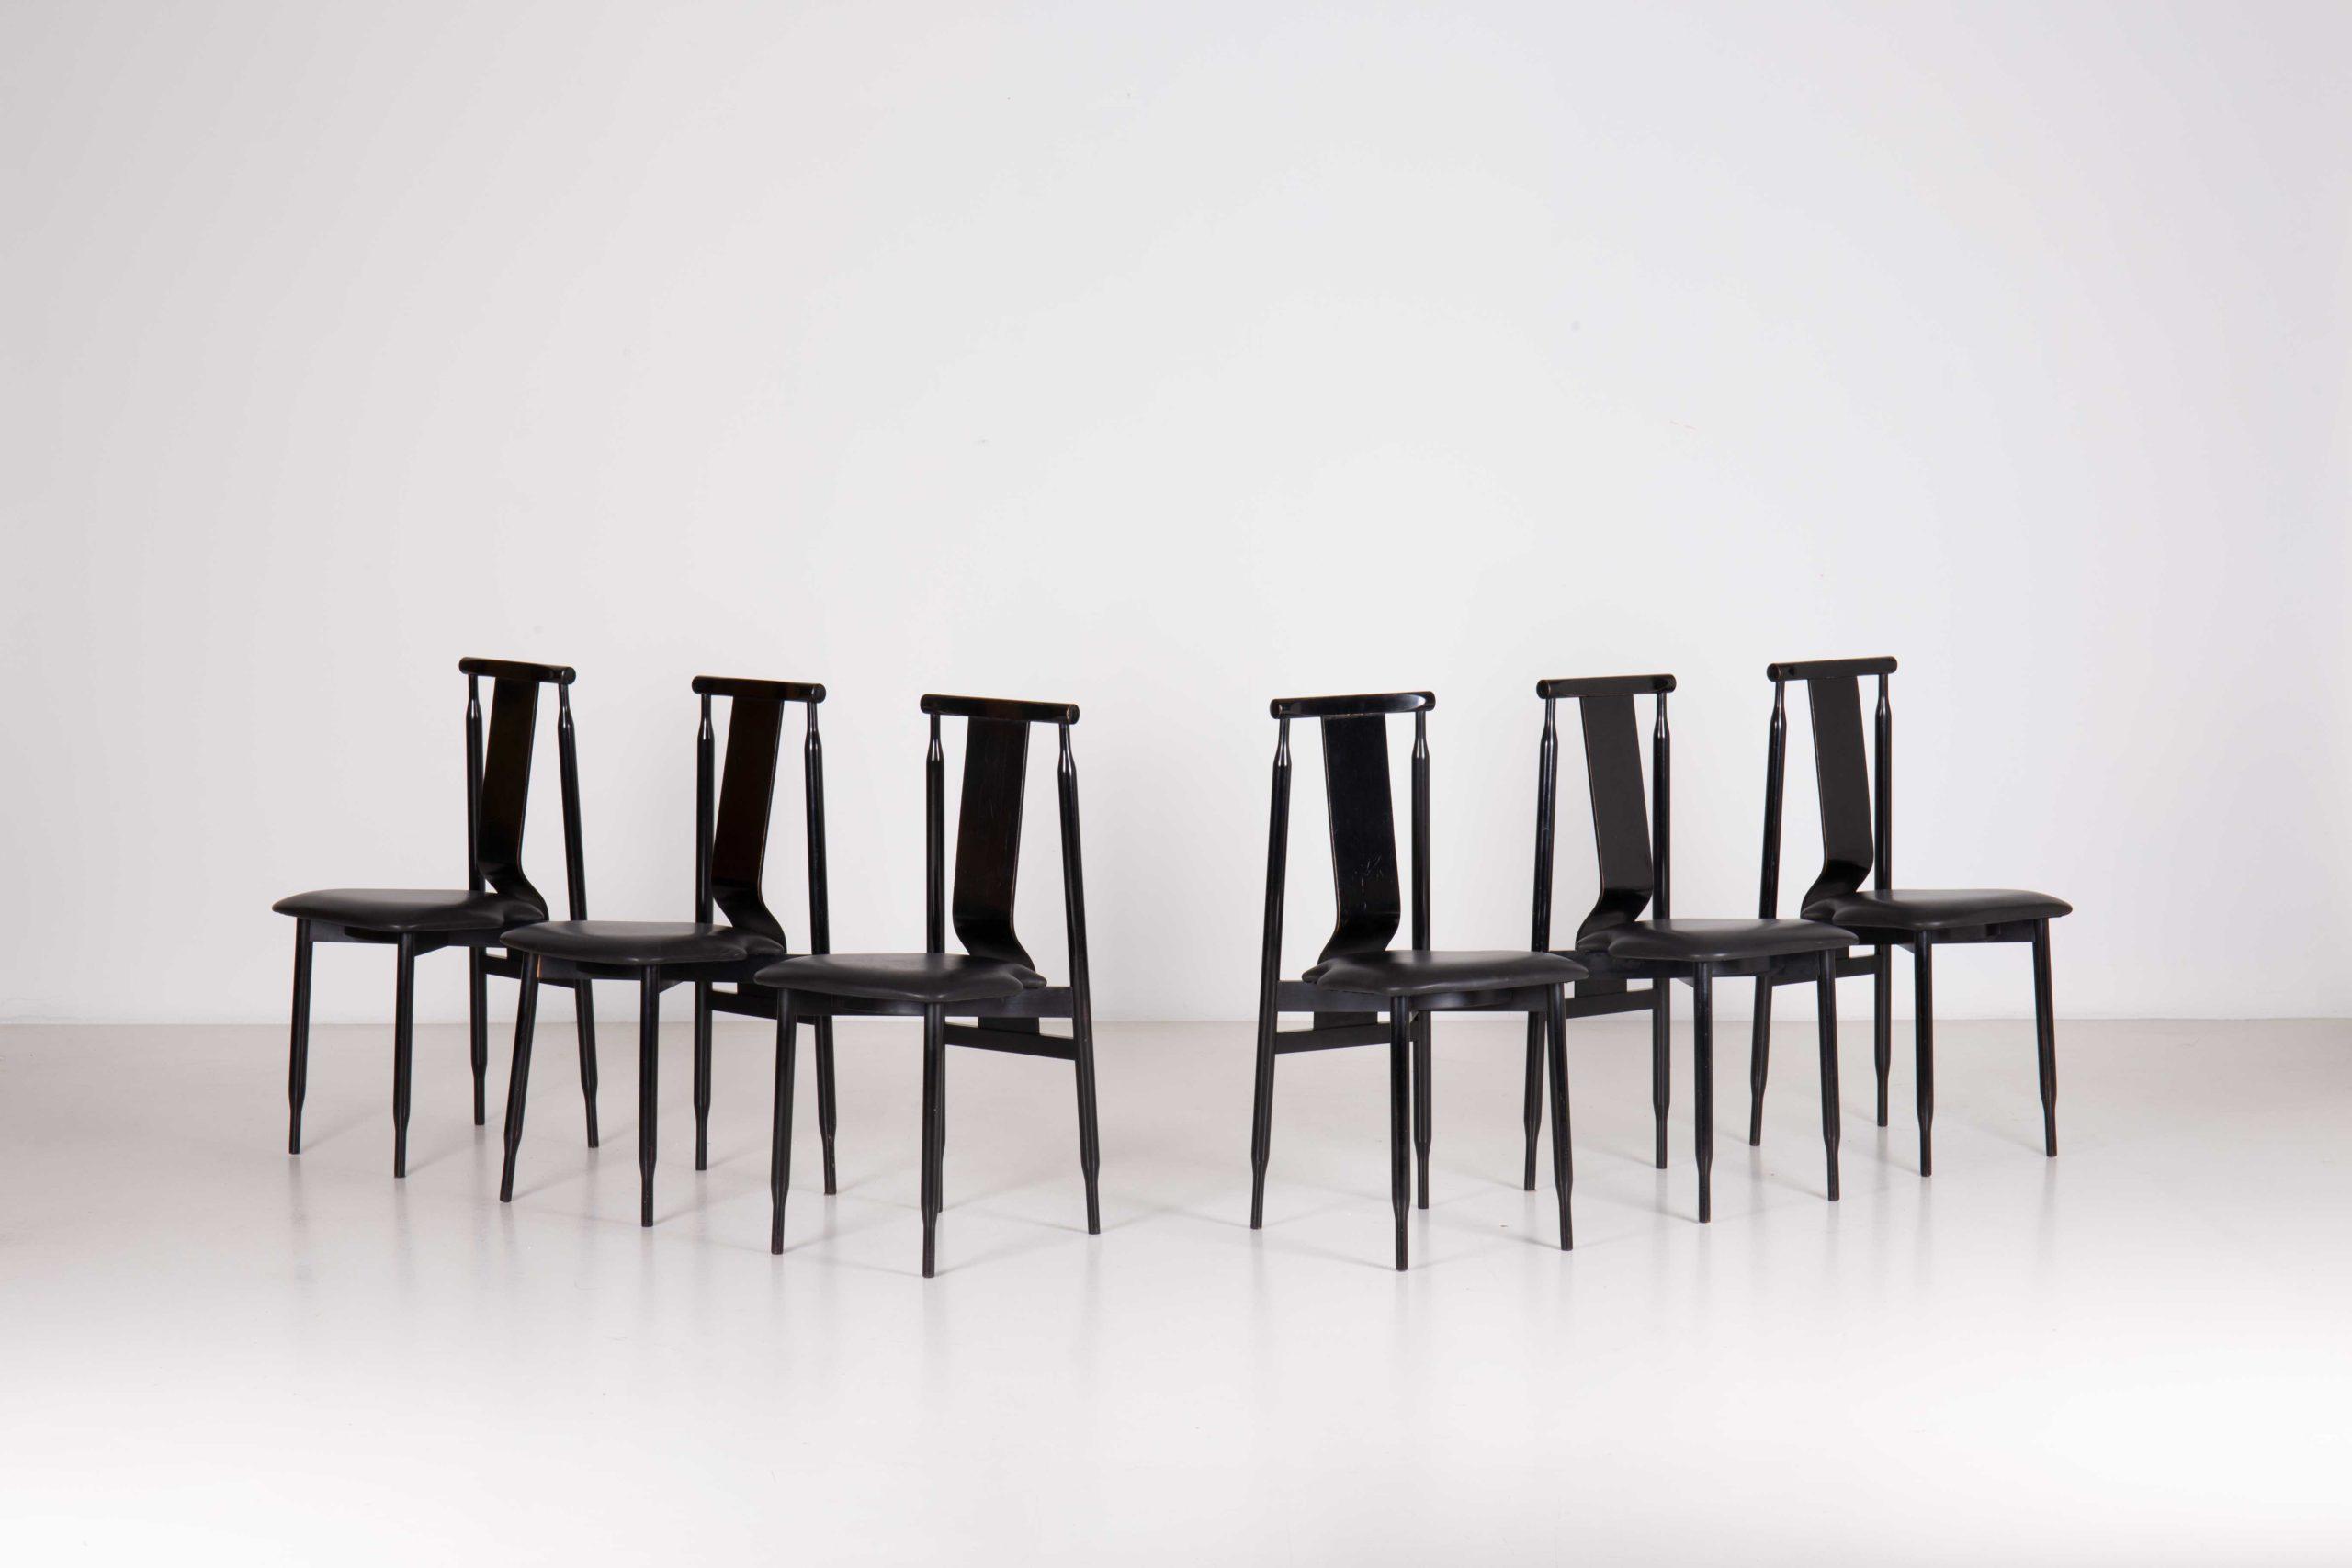 Lierna chairs by Achille & Pier Giacomo Castiglioni | Paradisoterrestre